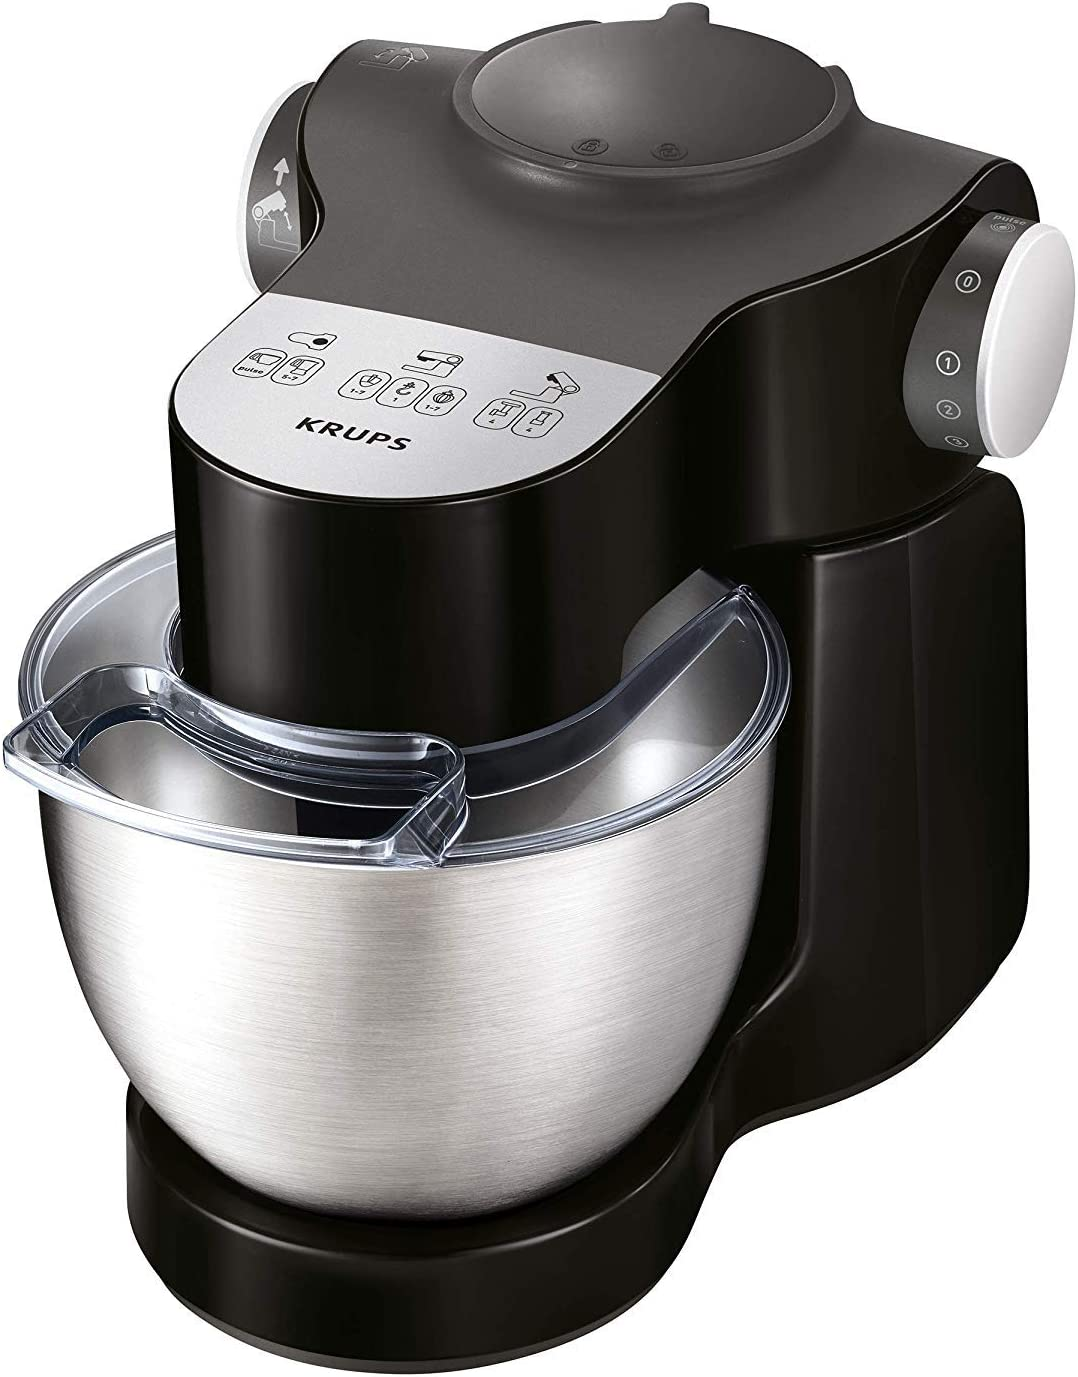 Krups KA3198 Master Perfect Plus Robot de cocina, 1000 W, 4 litros ...